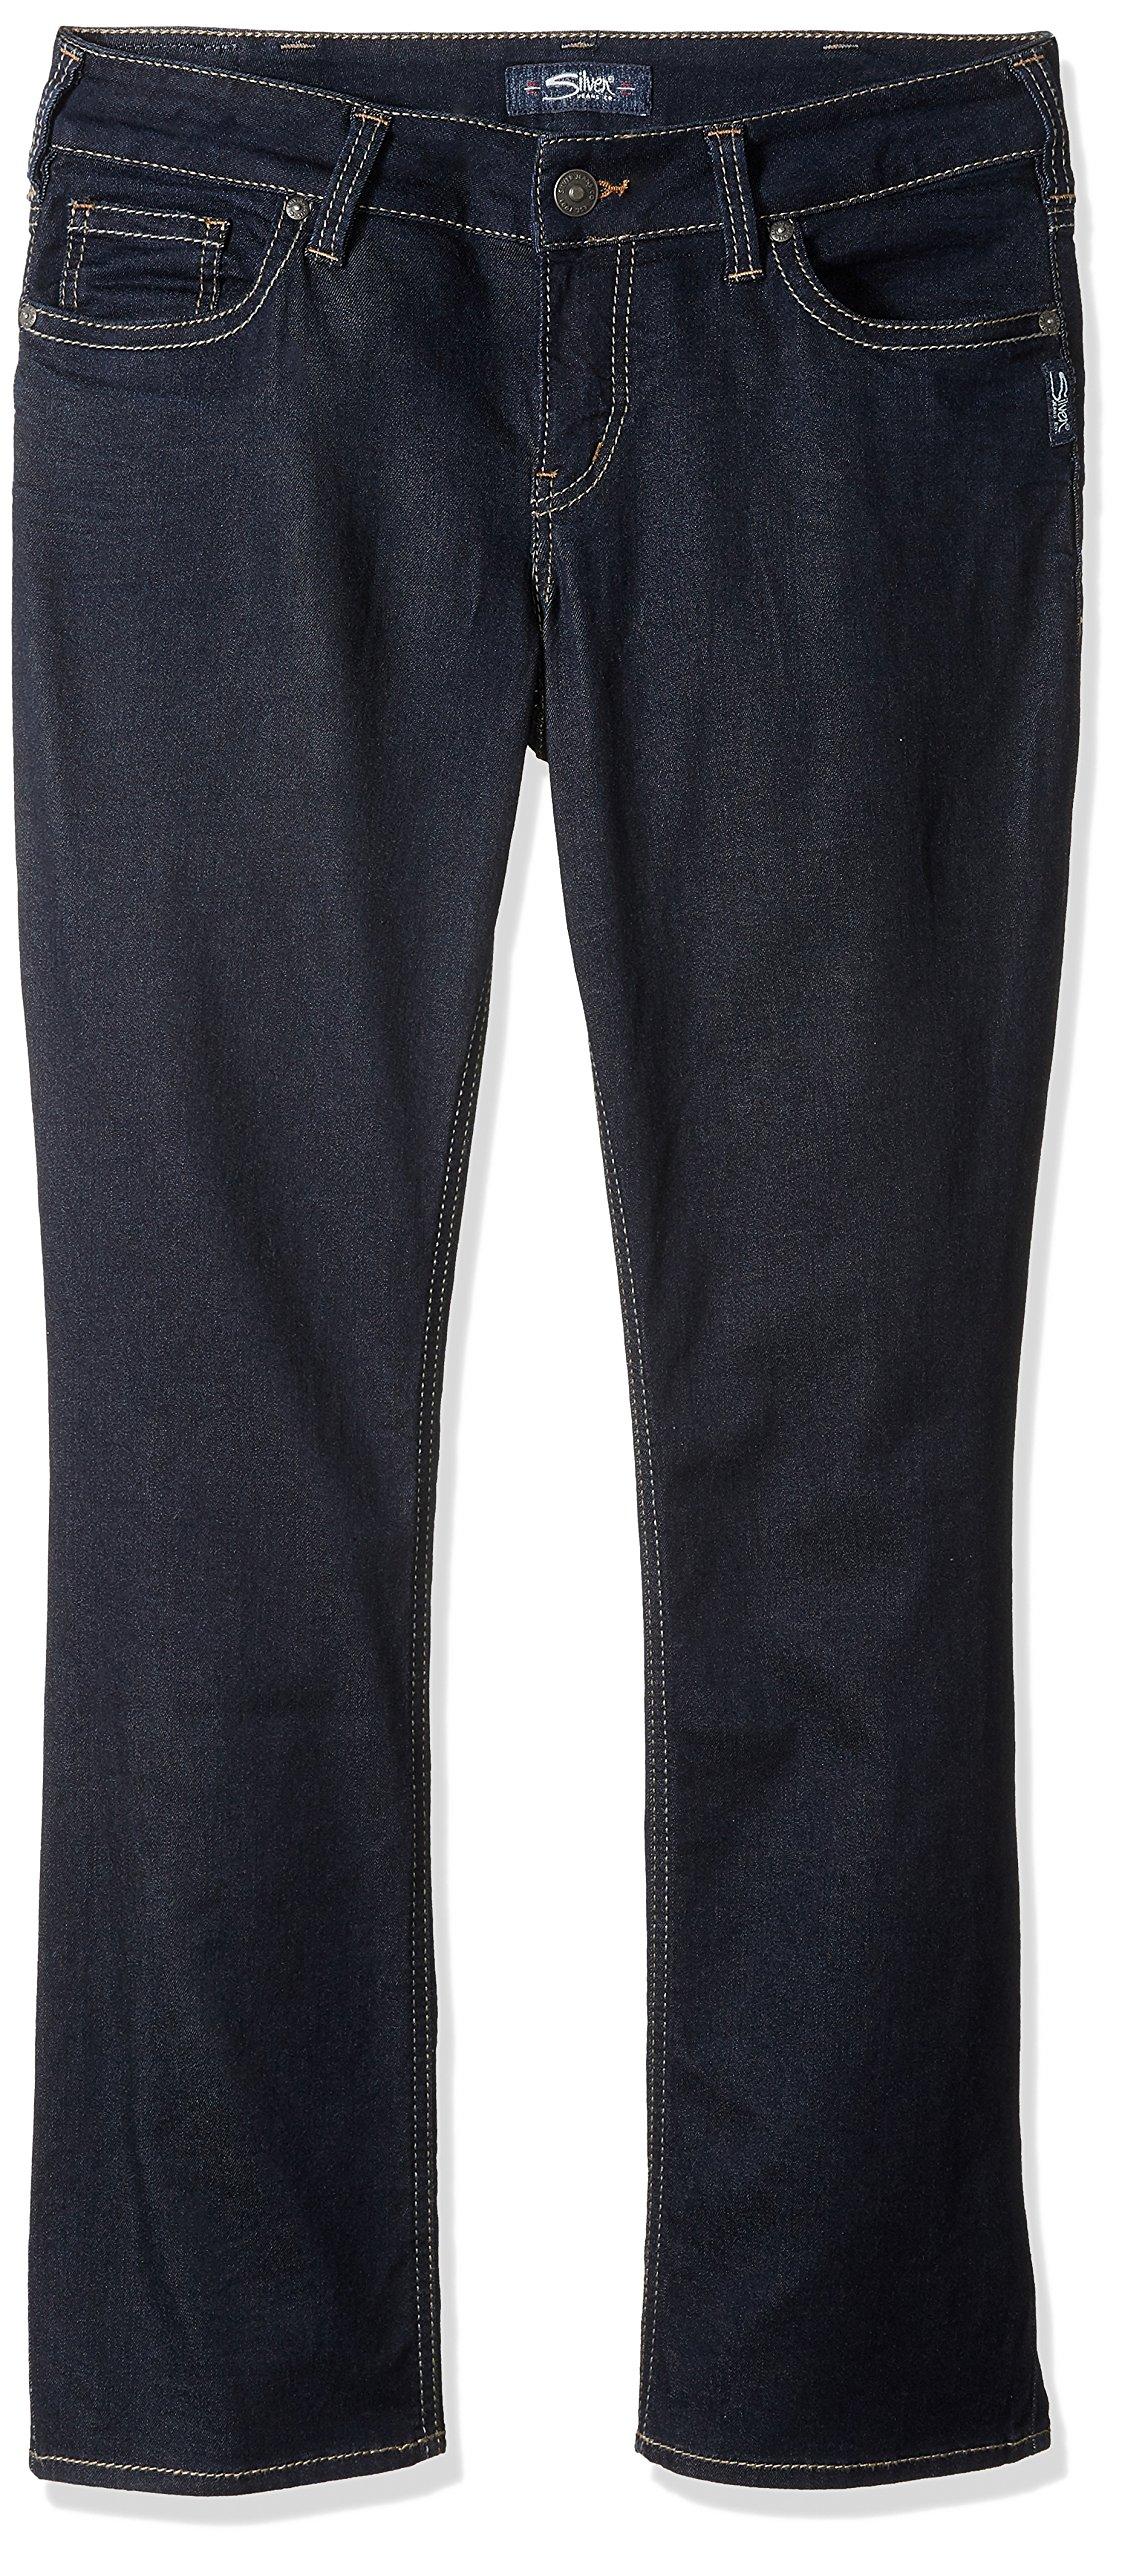 Silver Jeans Women's Plus Size Suki Curvy Fit Slim Bootcut Jeans, Rinse Wash, 24 X 33